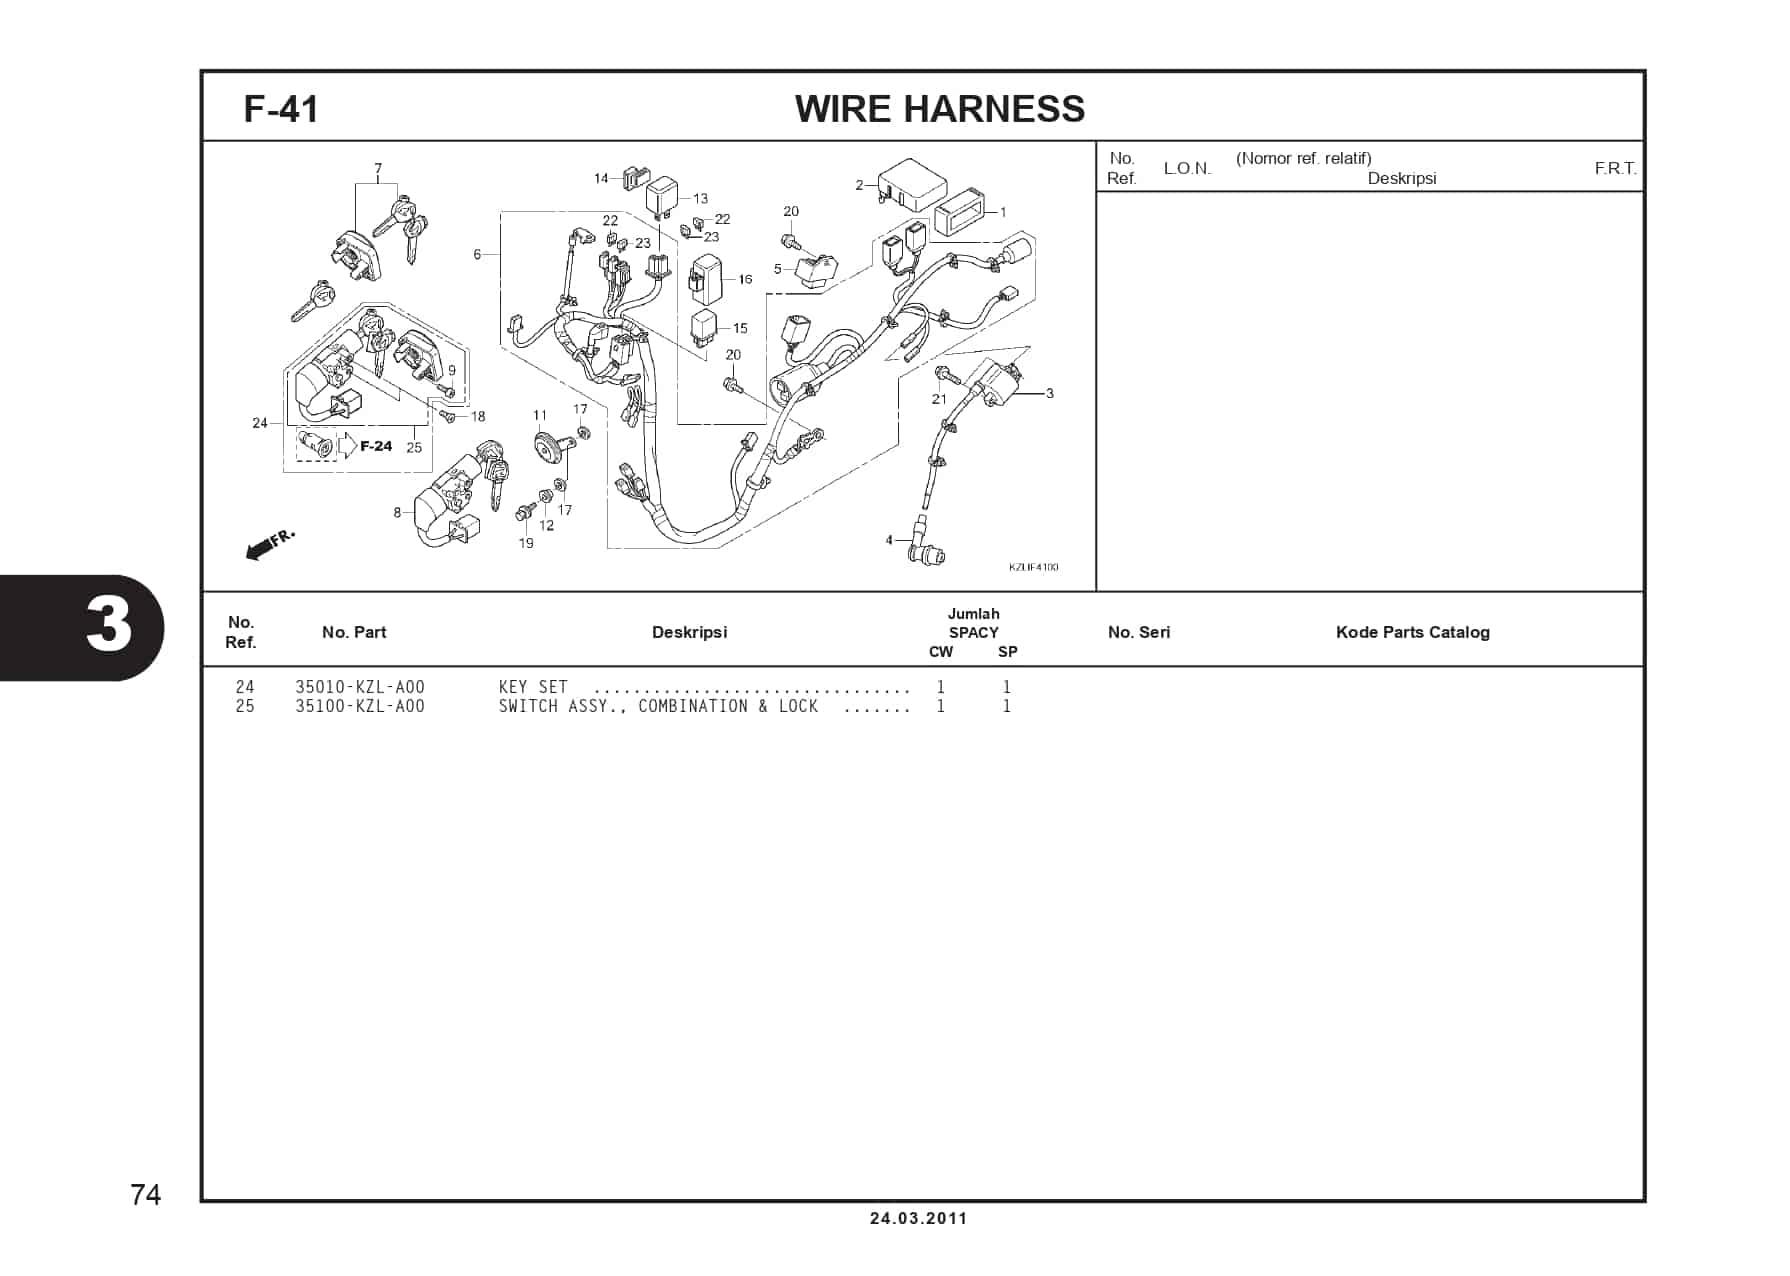 F-41 WIRE HARNESS